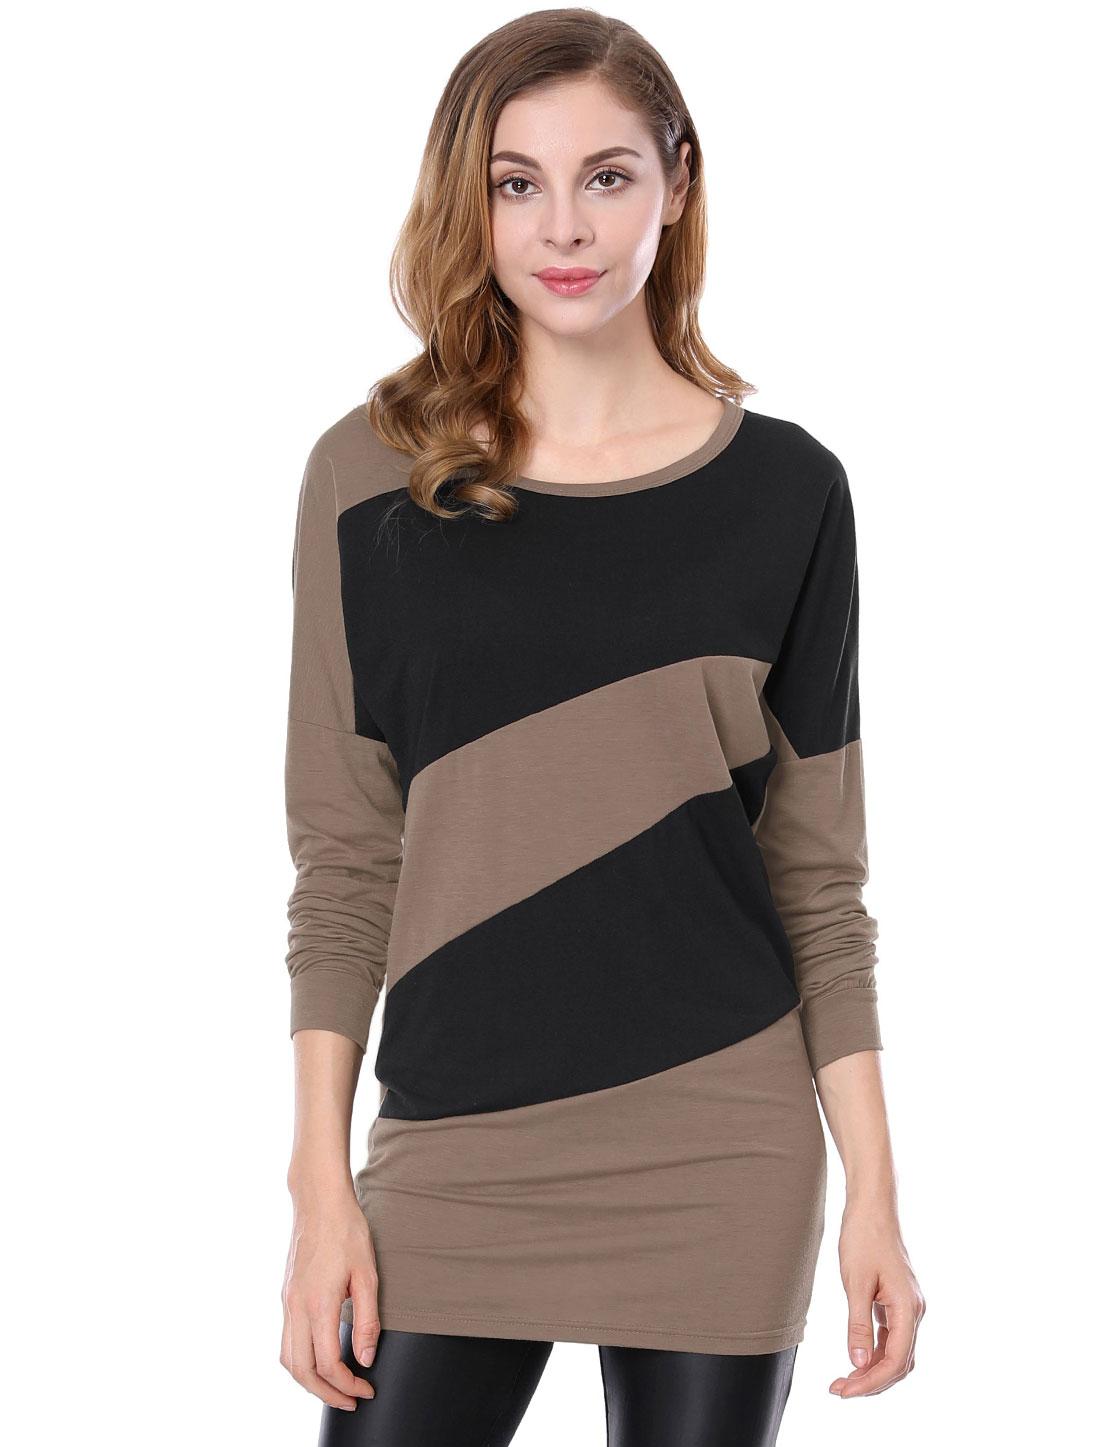 Woman Stylish Light Coffee Black Color Block Loose Blouson Tunic M